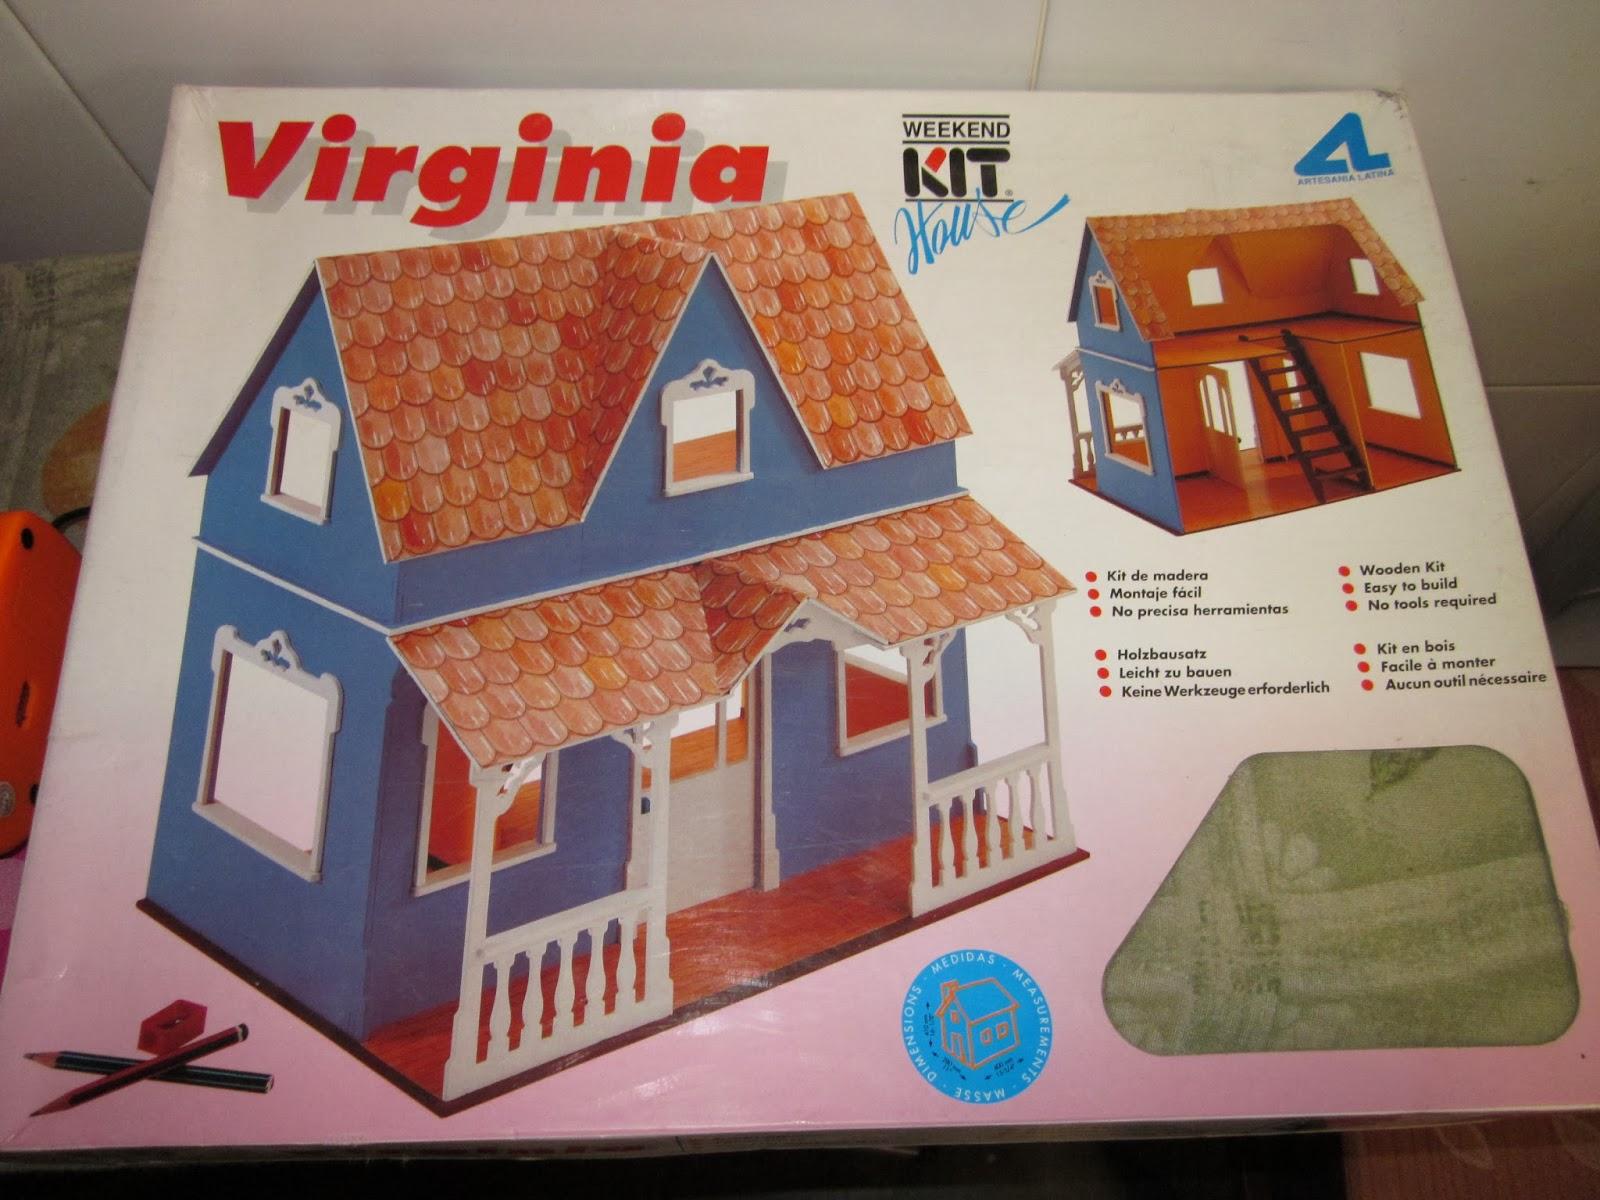 Kos y tas miniaturas casa moderna for Casa moderna 2014 espositori